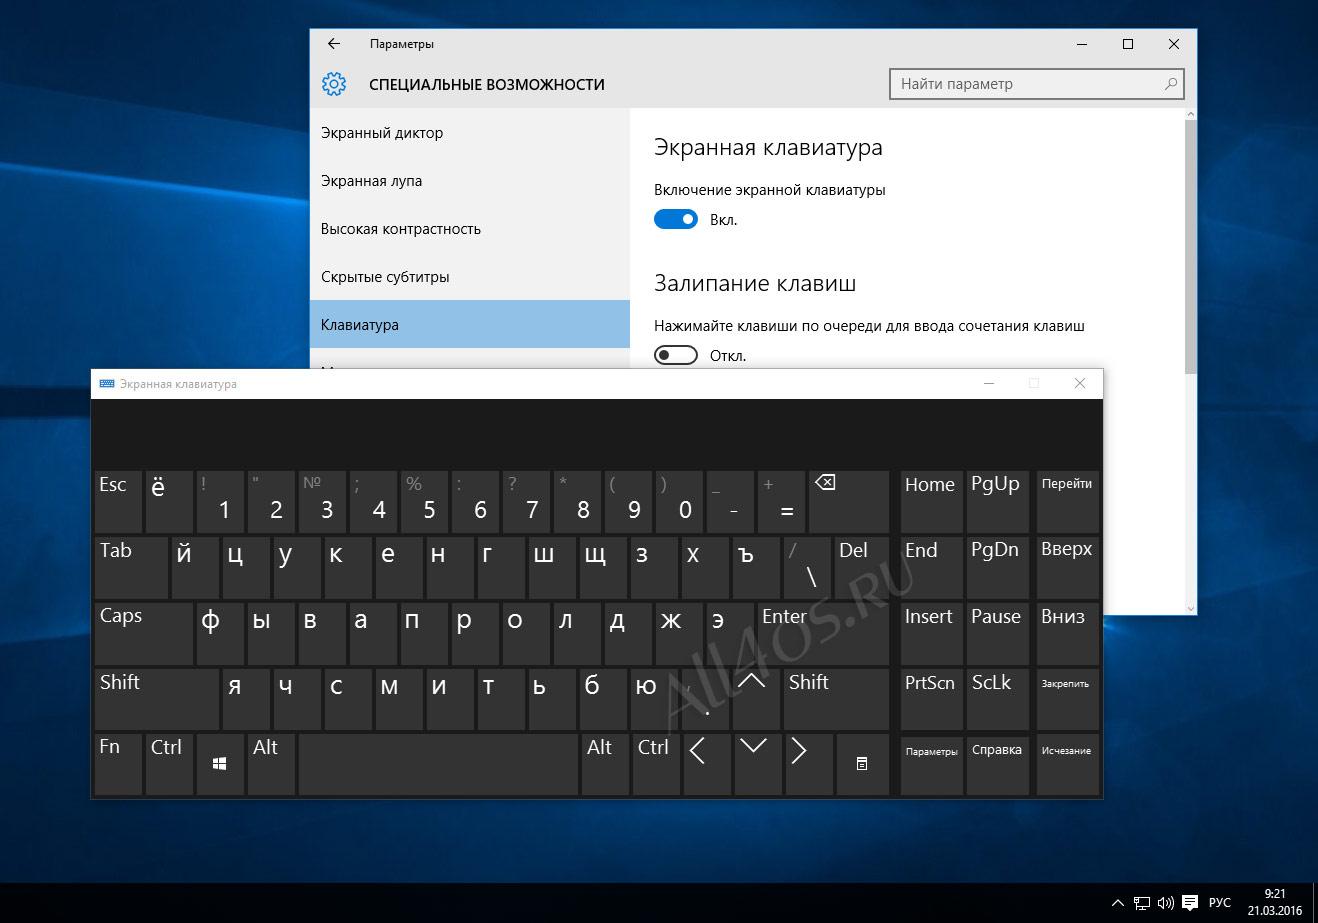 Как включить клавиатуру на планшете?